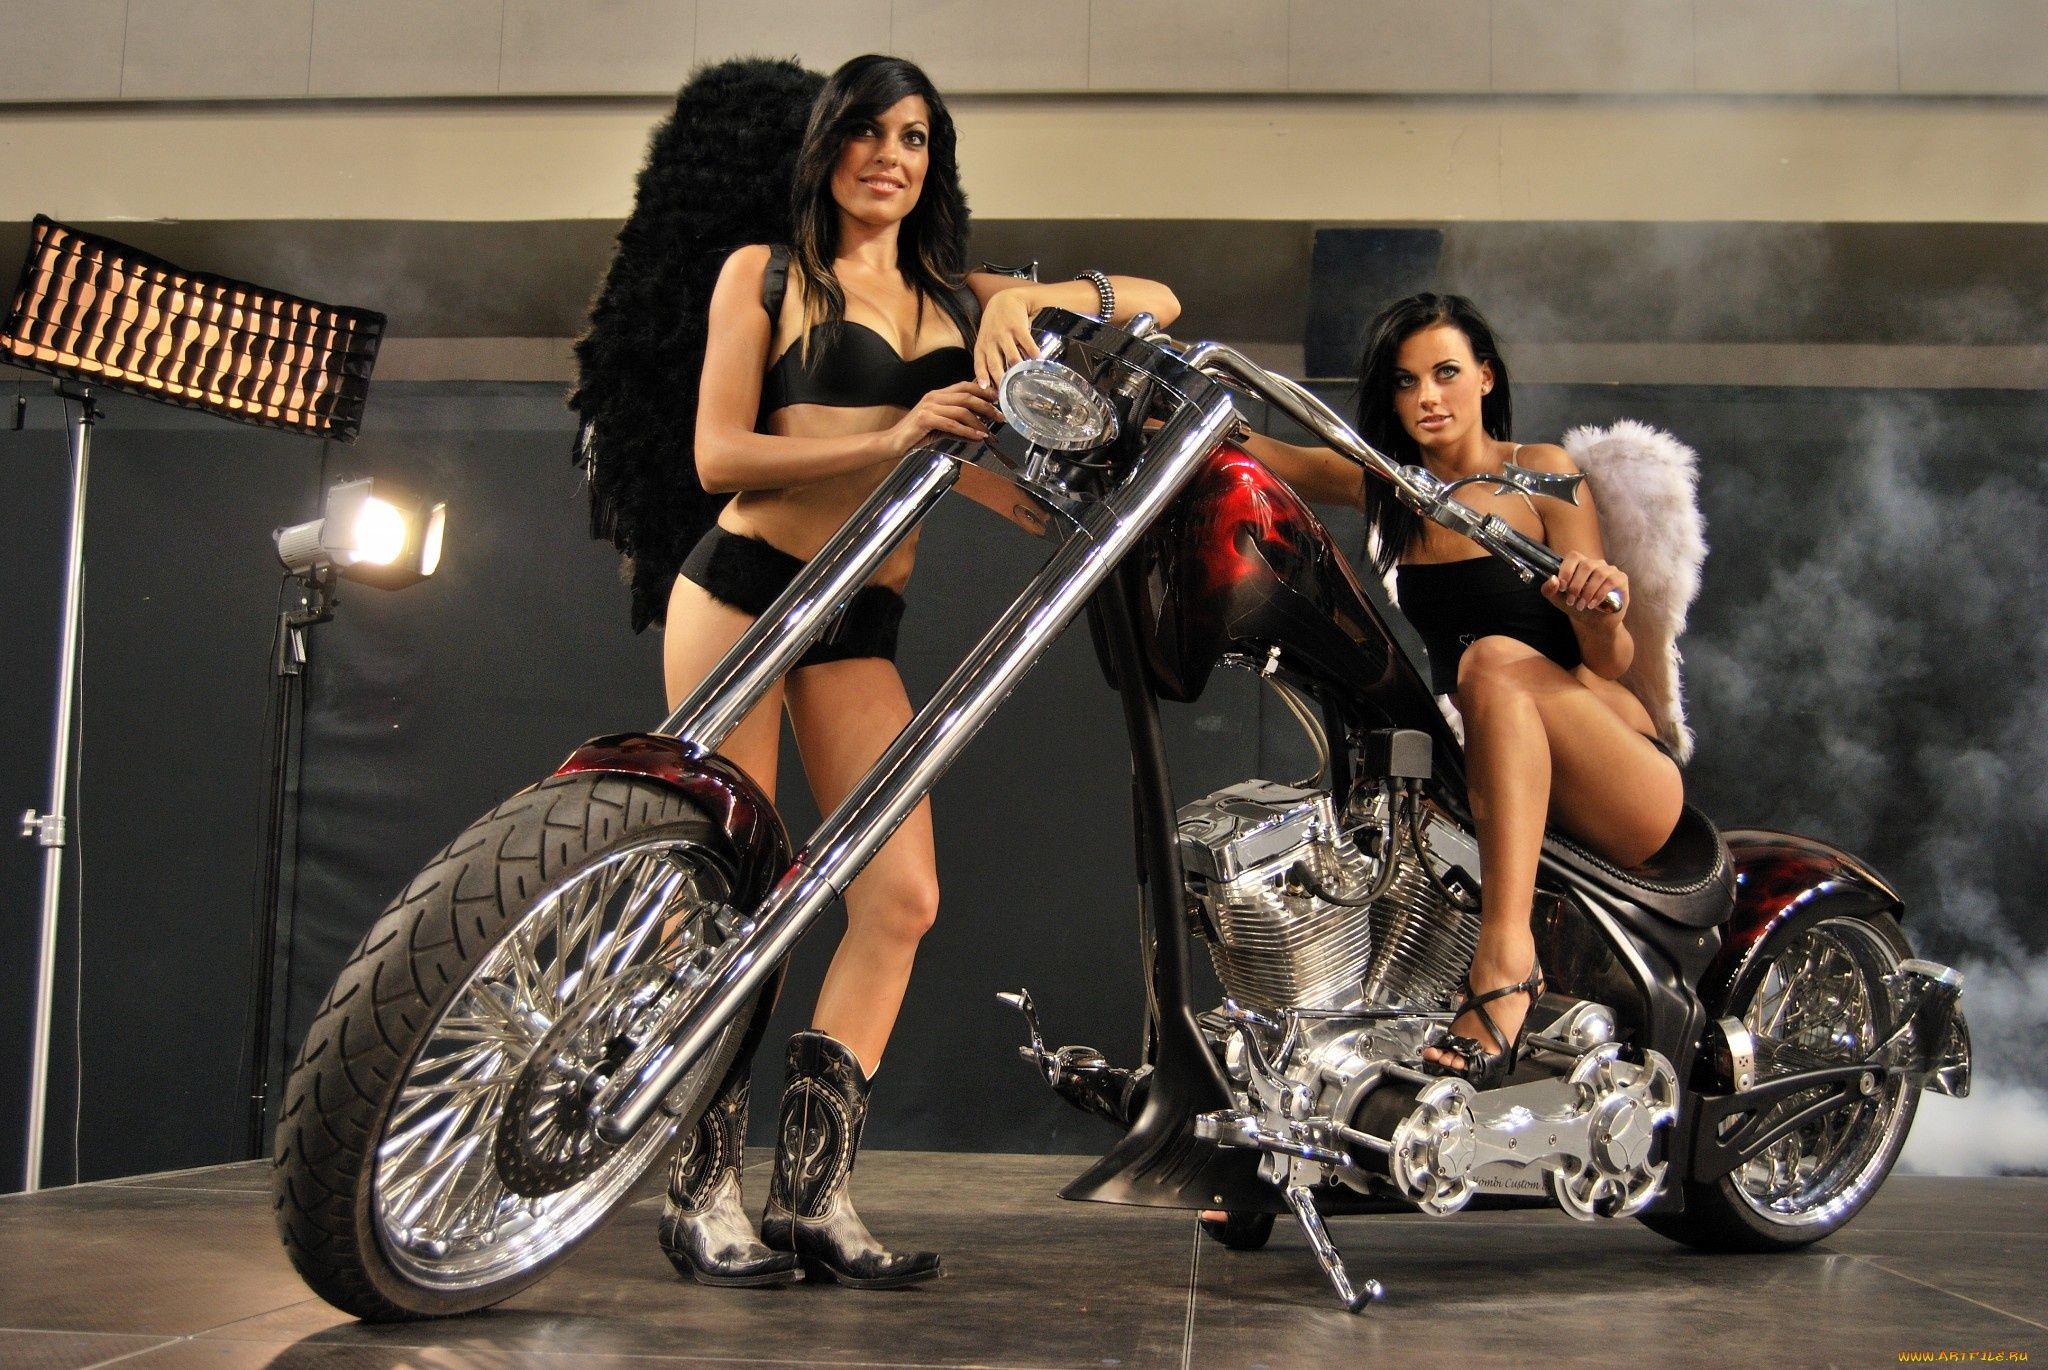 skinny-nude-black-motorbike-showgirls-amateur-video-hosting